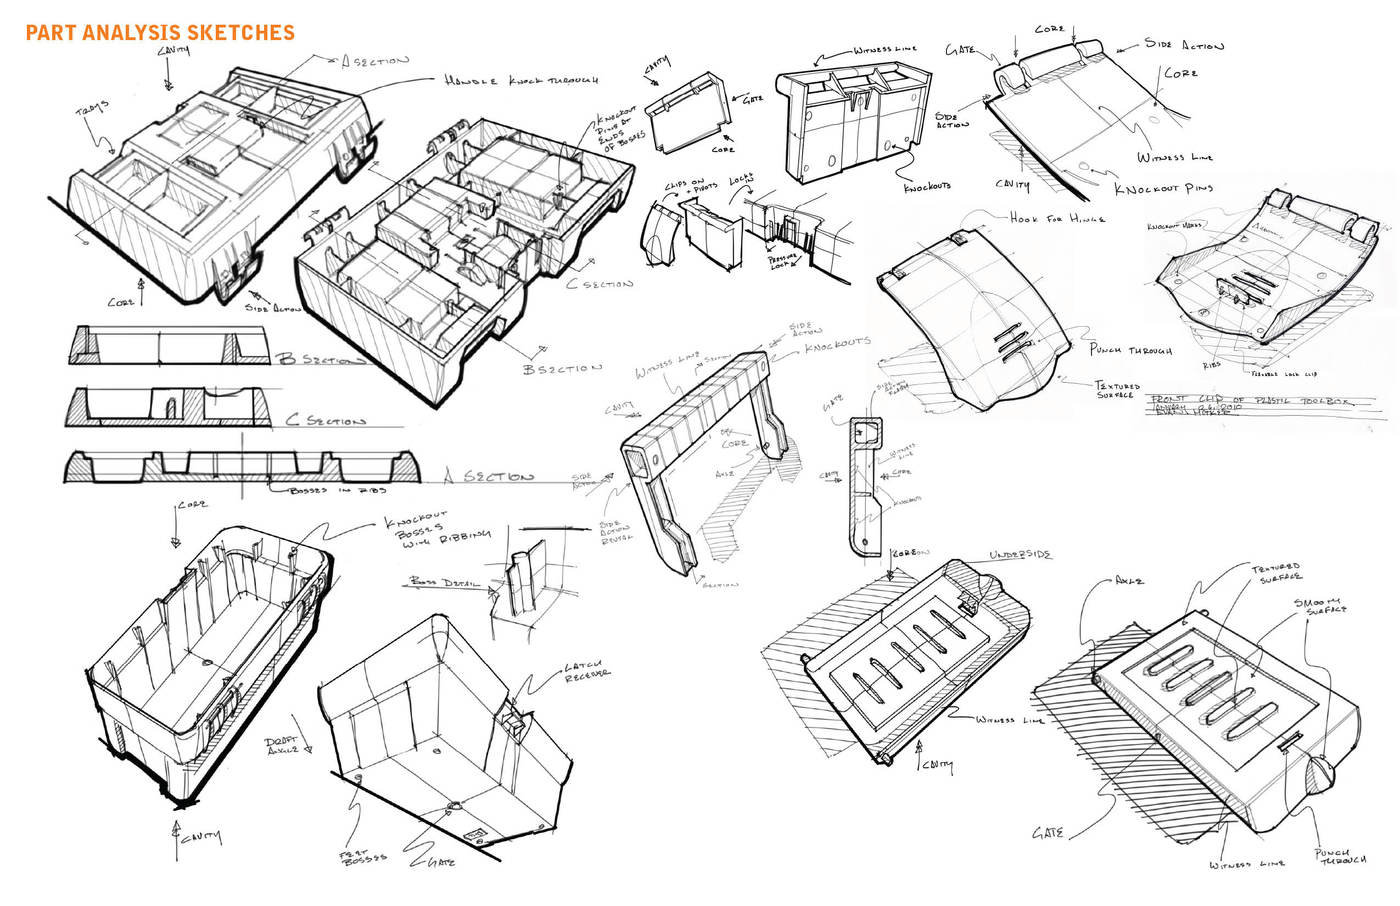 Sketches by Evan Hutker at Coroflot.com